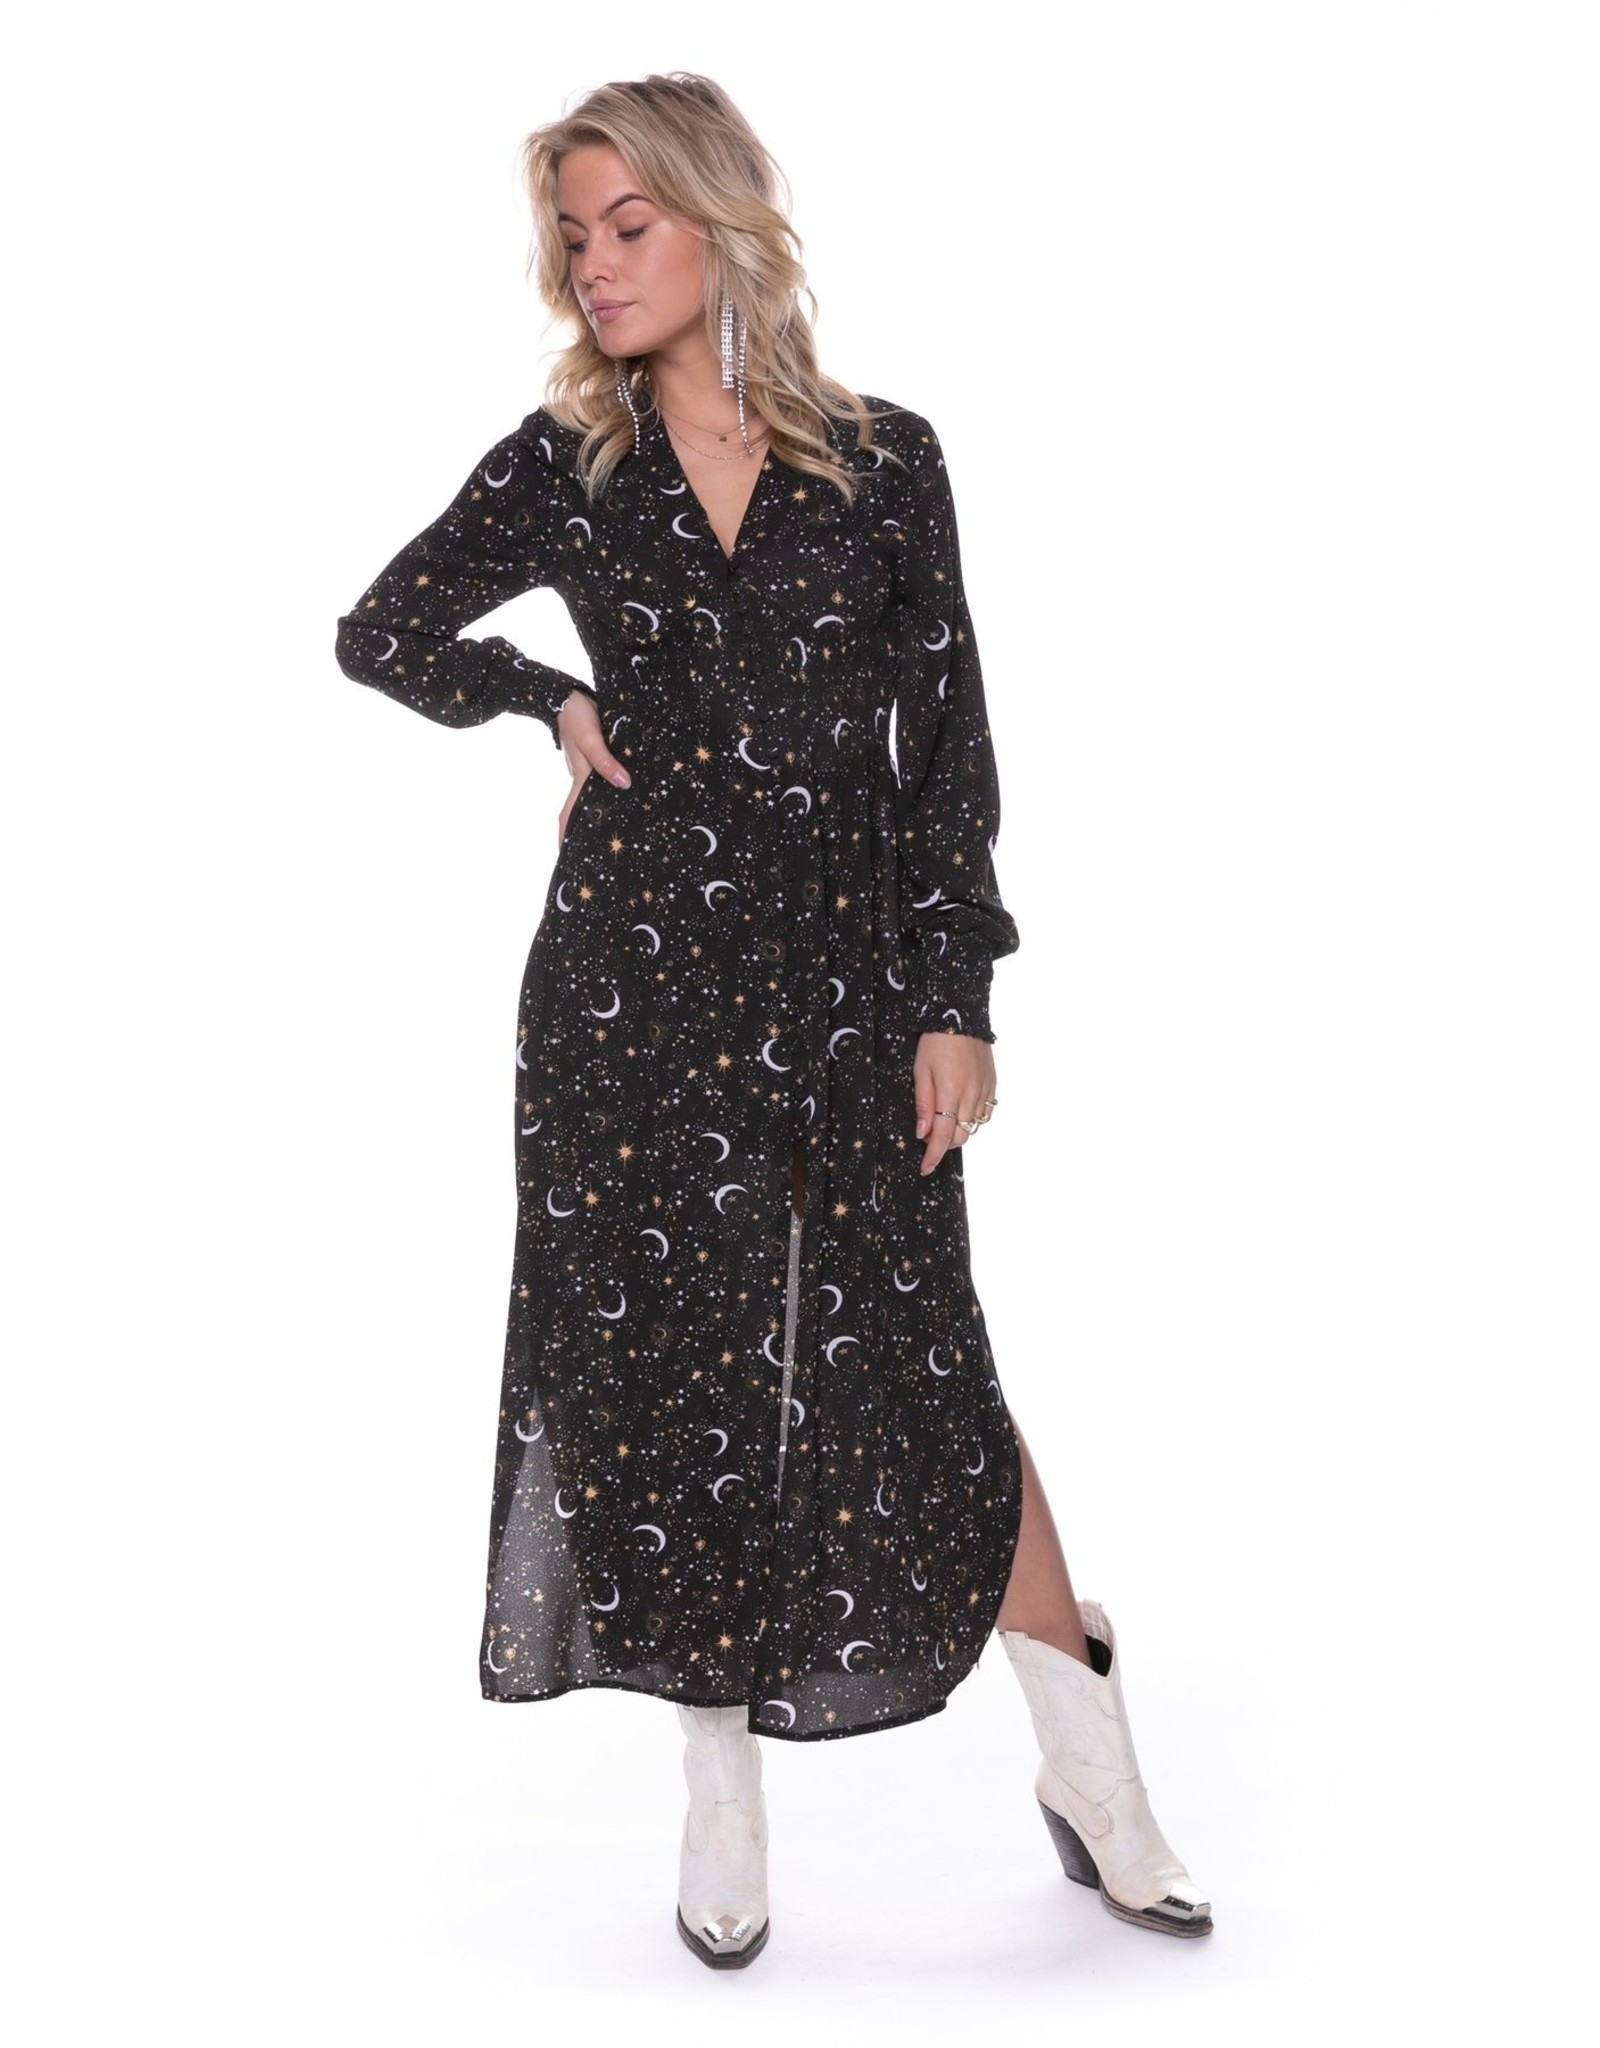 Colourful Rebel Harper Star Maxi Dress Black